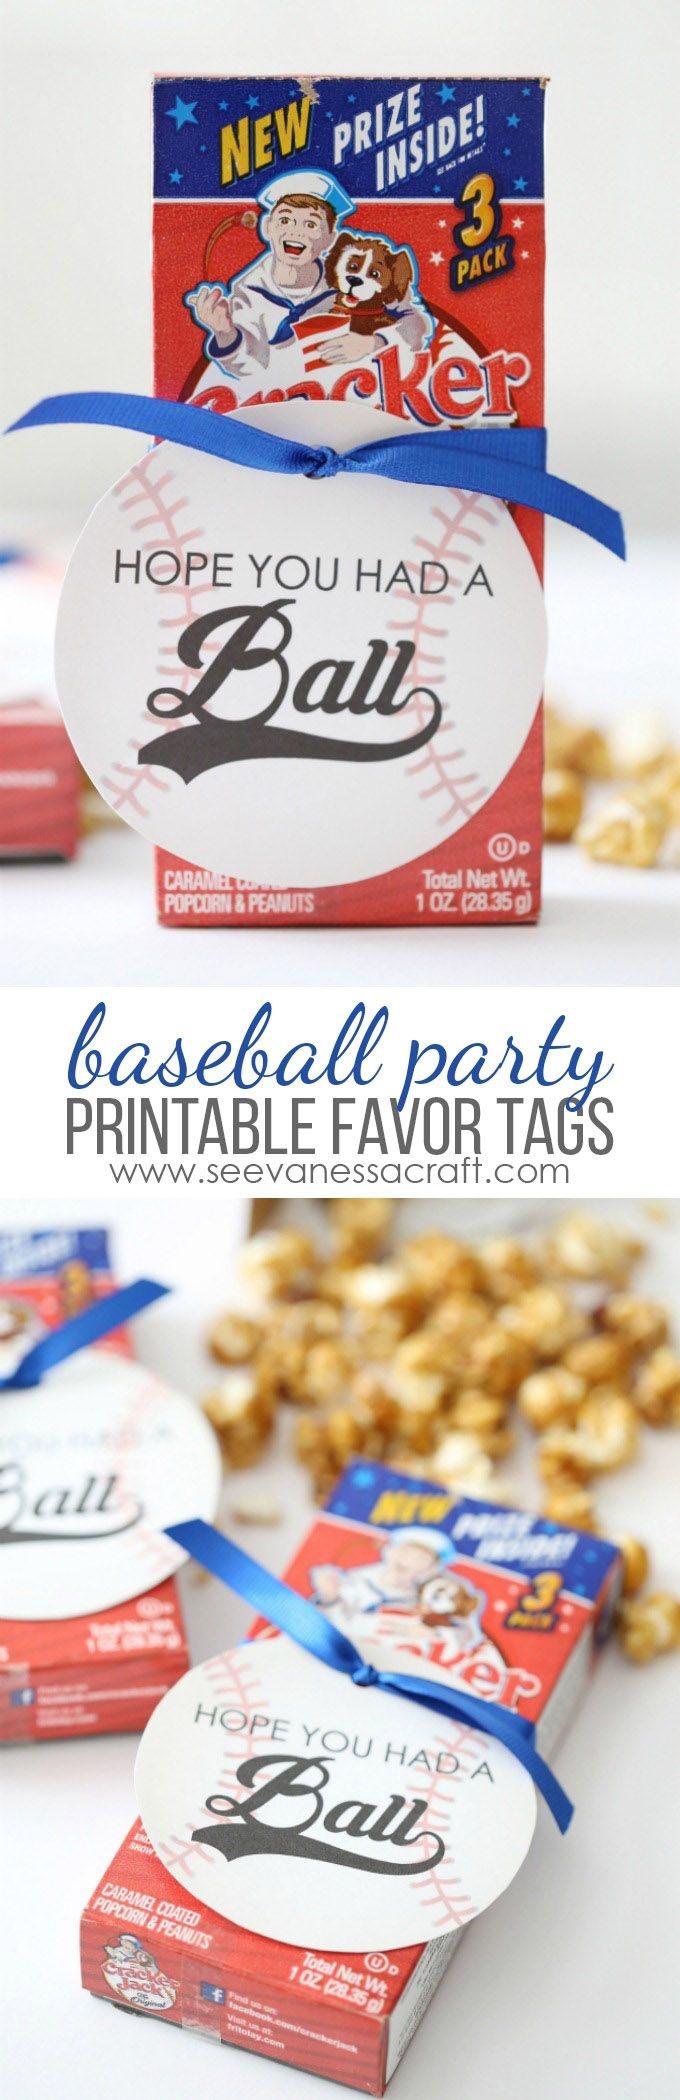 Baseball Birthday Party Favor Tags | Printables | Baseball Party - Free Printable Baseball Favor Tags